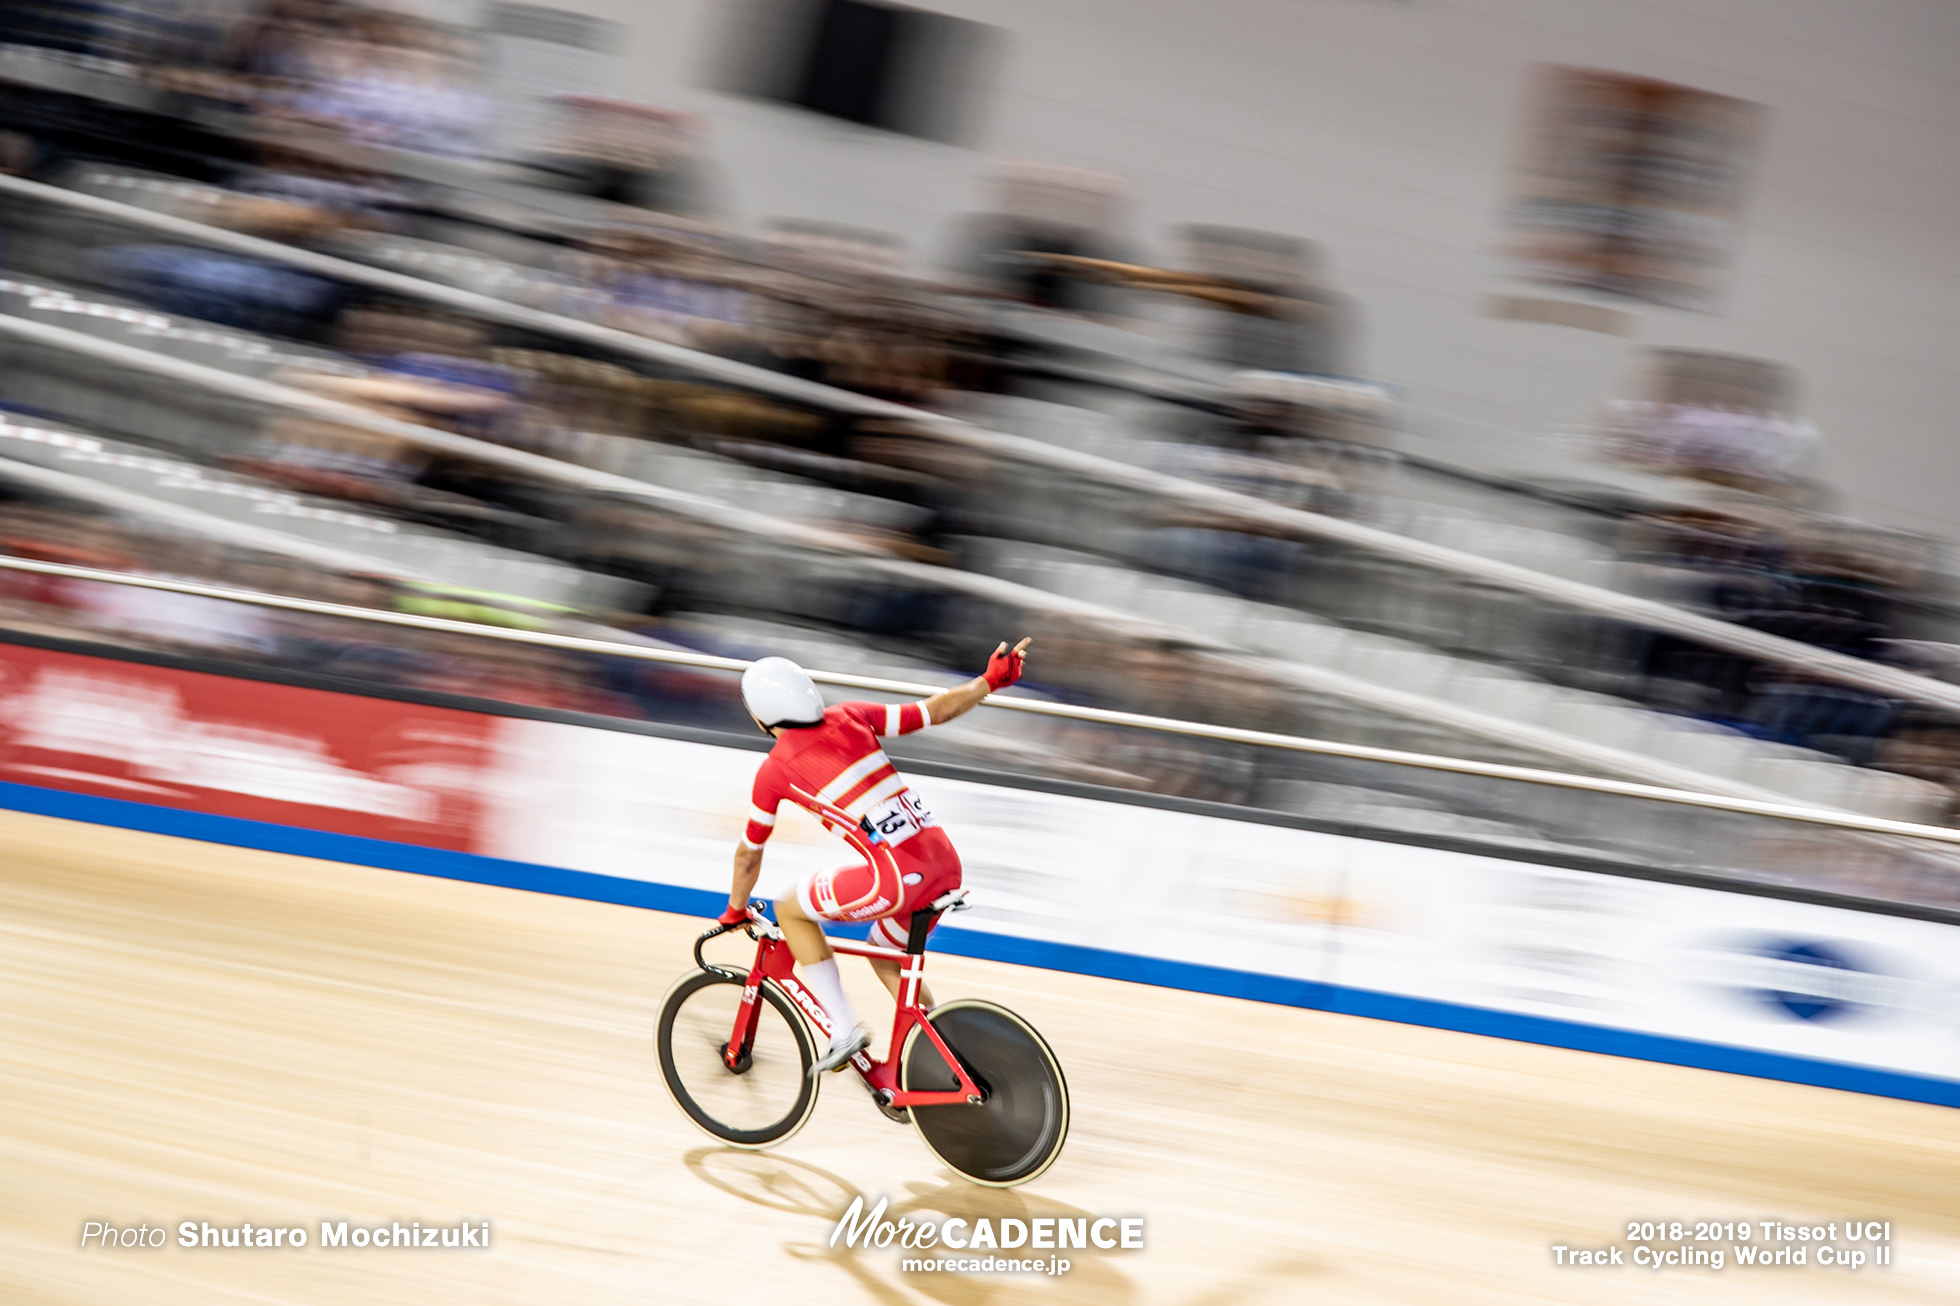 2018-2019 Tissot UCI Track Cycling World Cup II Men's Madison